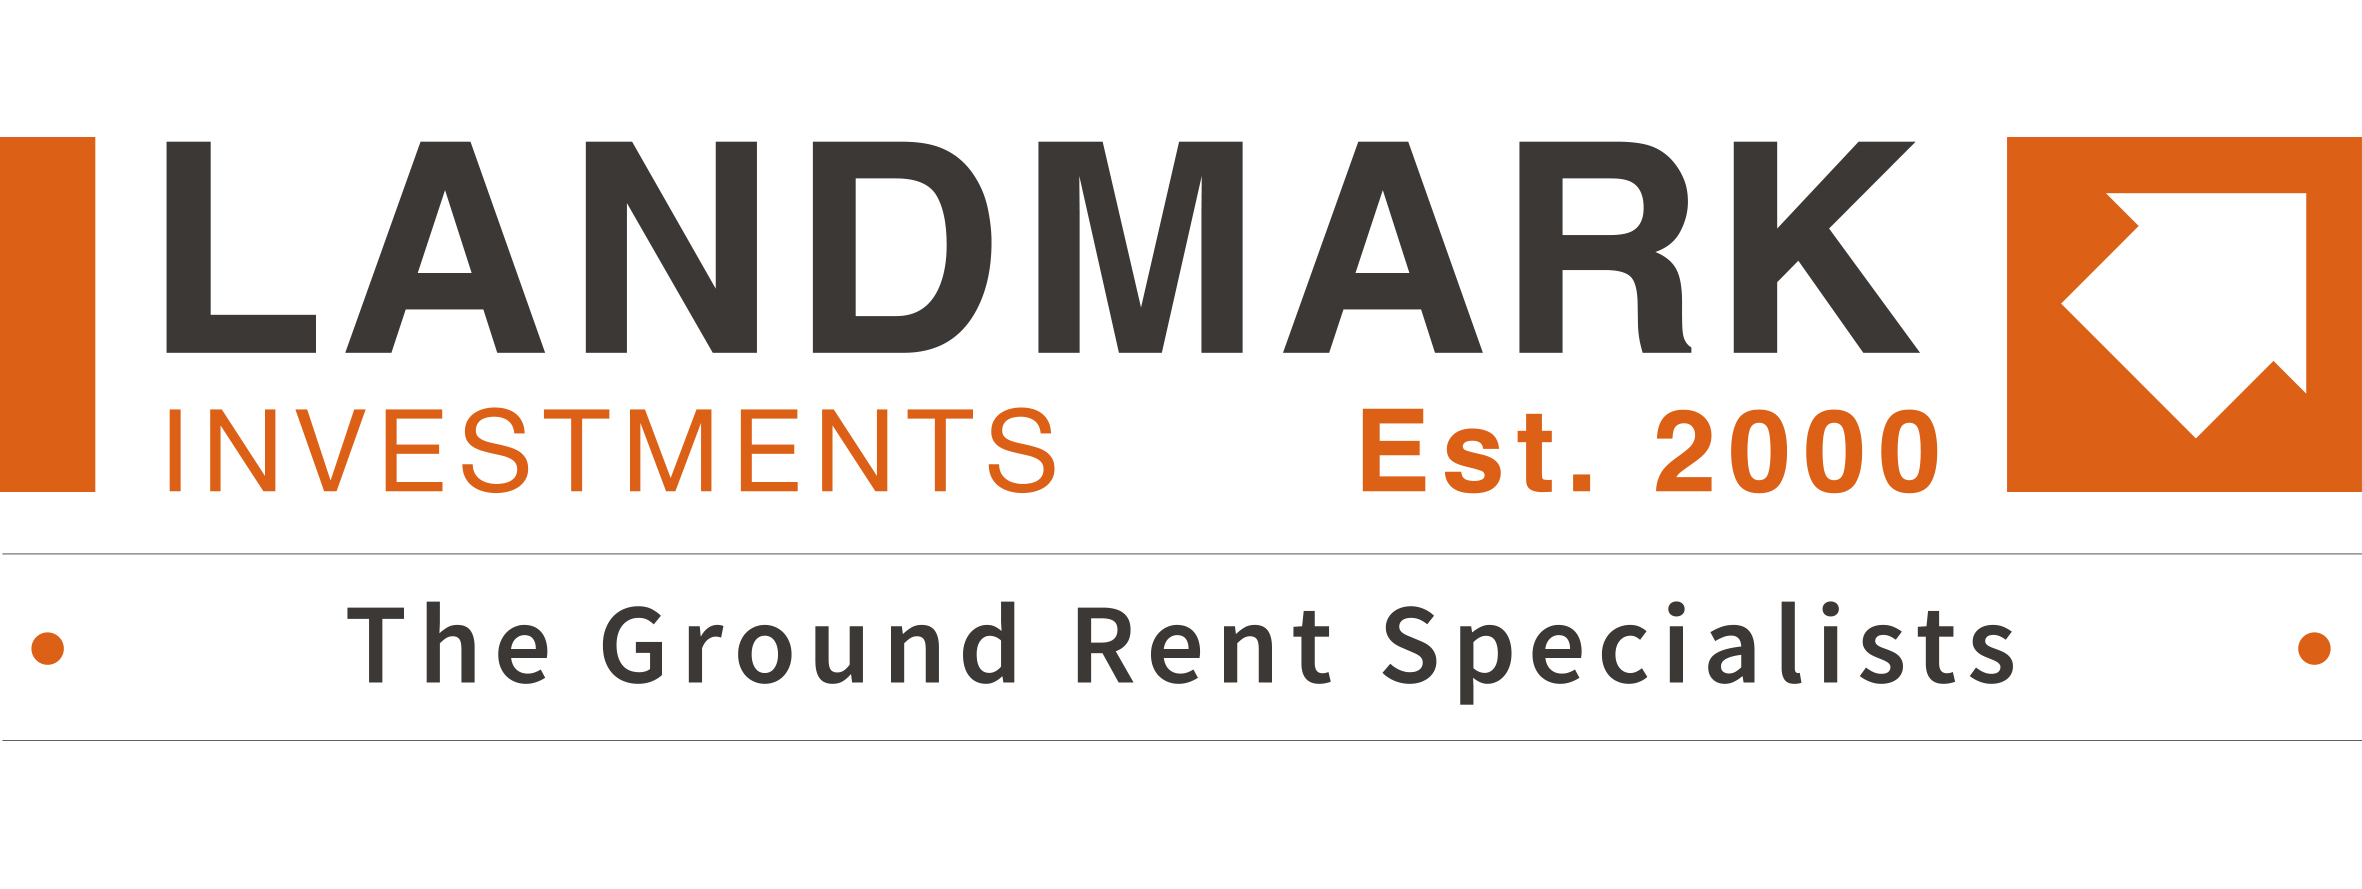 Landmark Investments